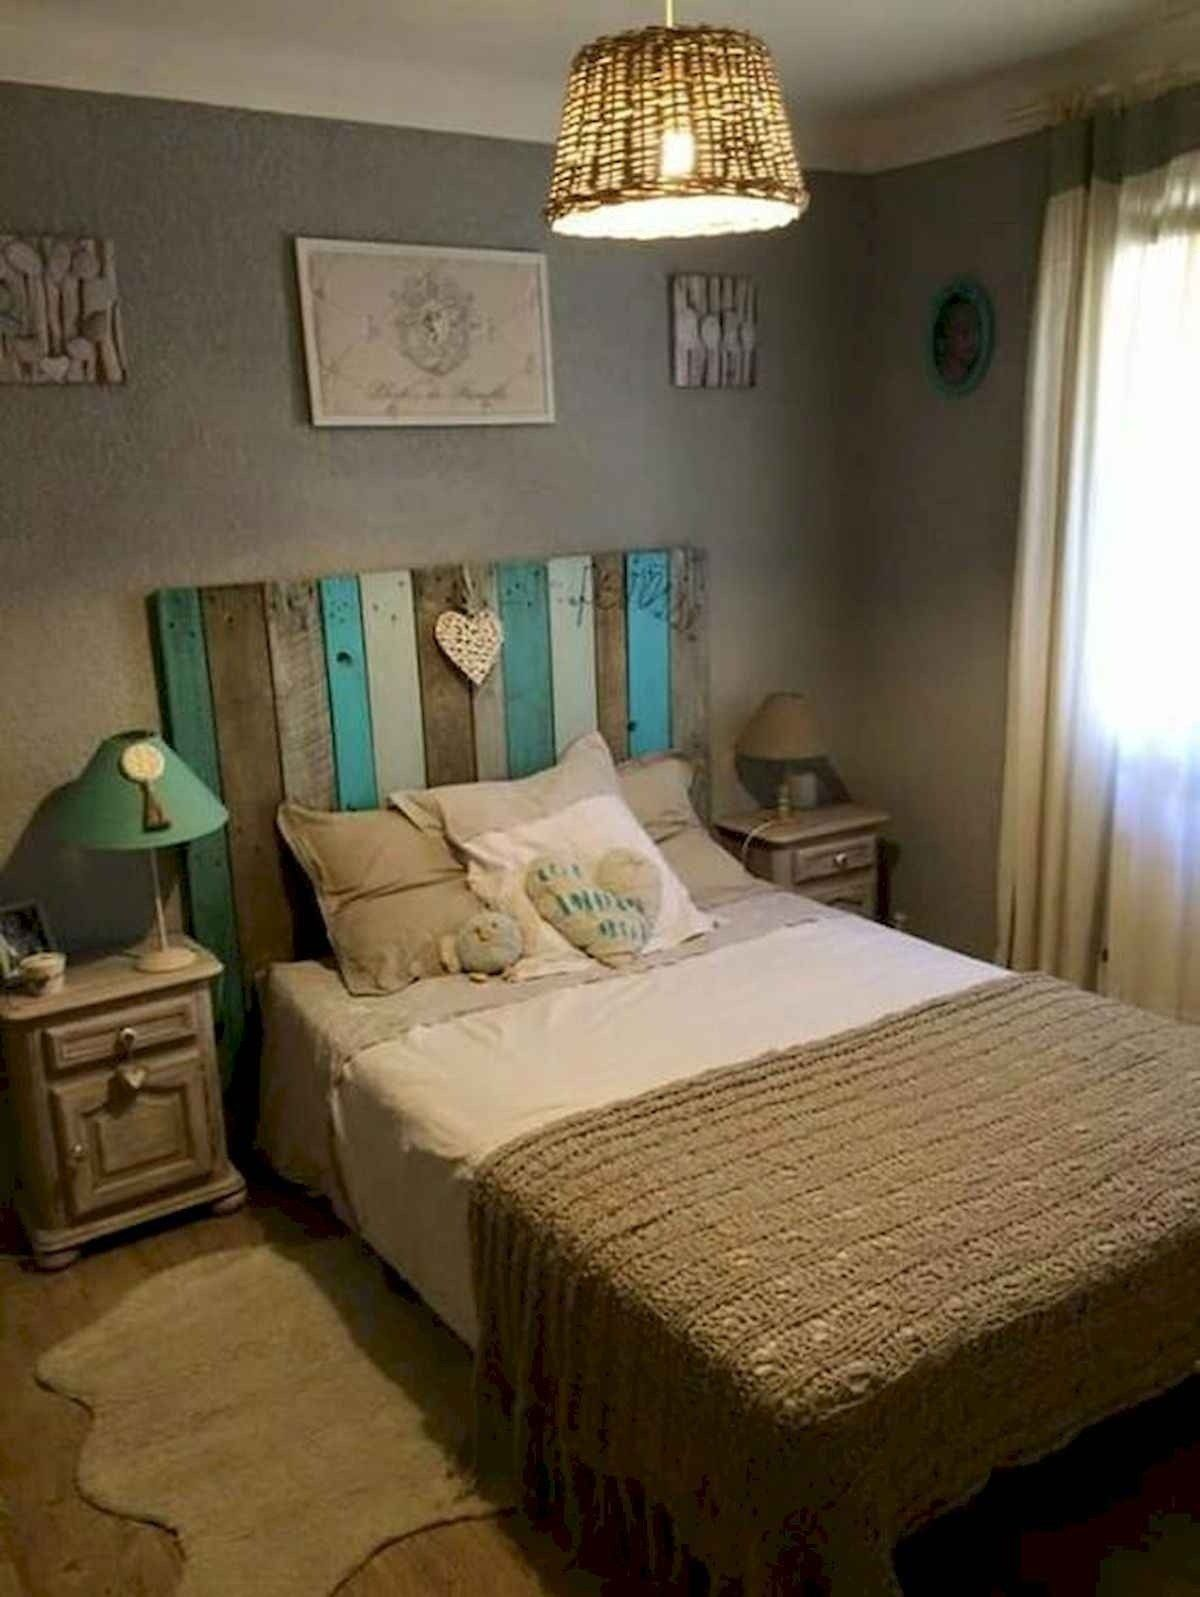 Rustic Romantic Bedroom Ideas: 60 Most Creative DIY Projects Pallet Headboards Bedroom